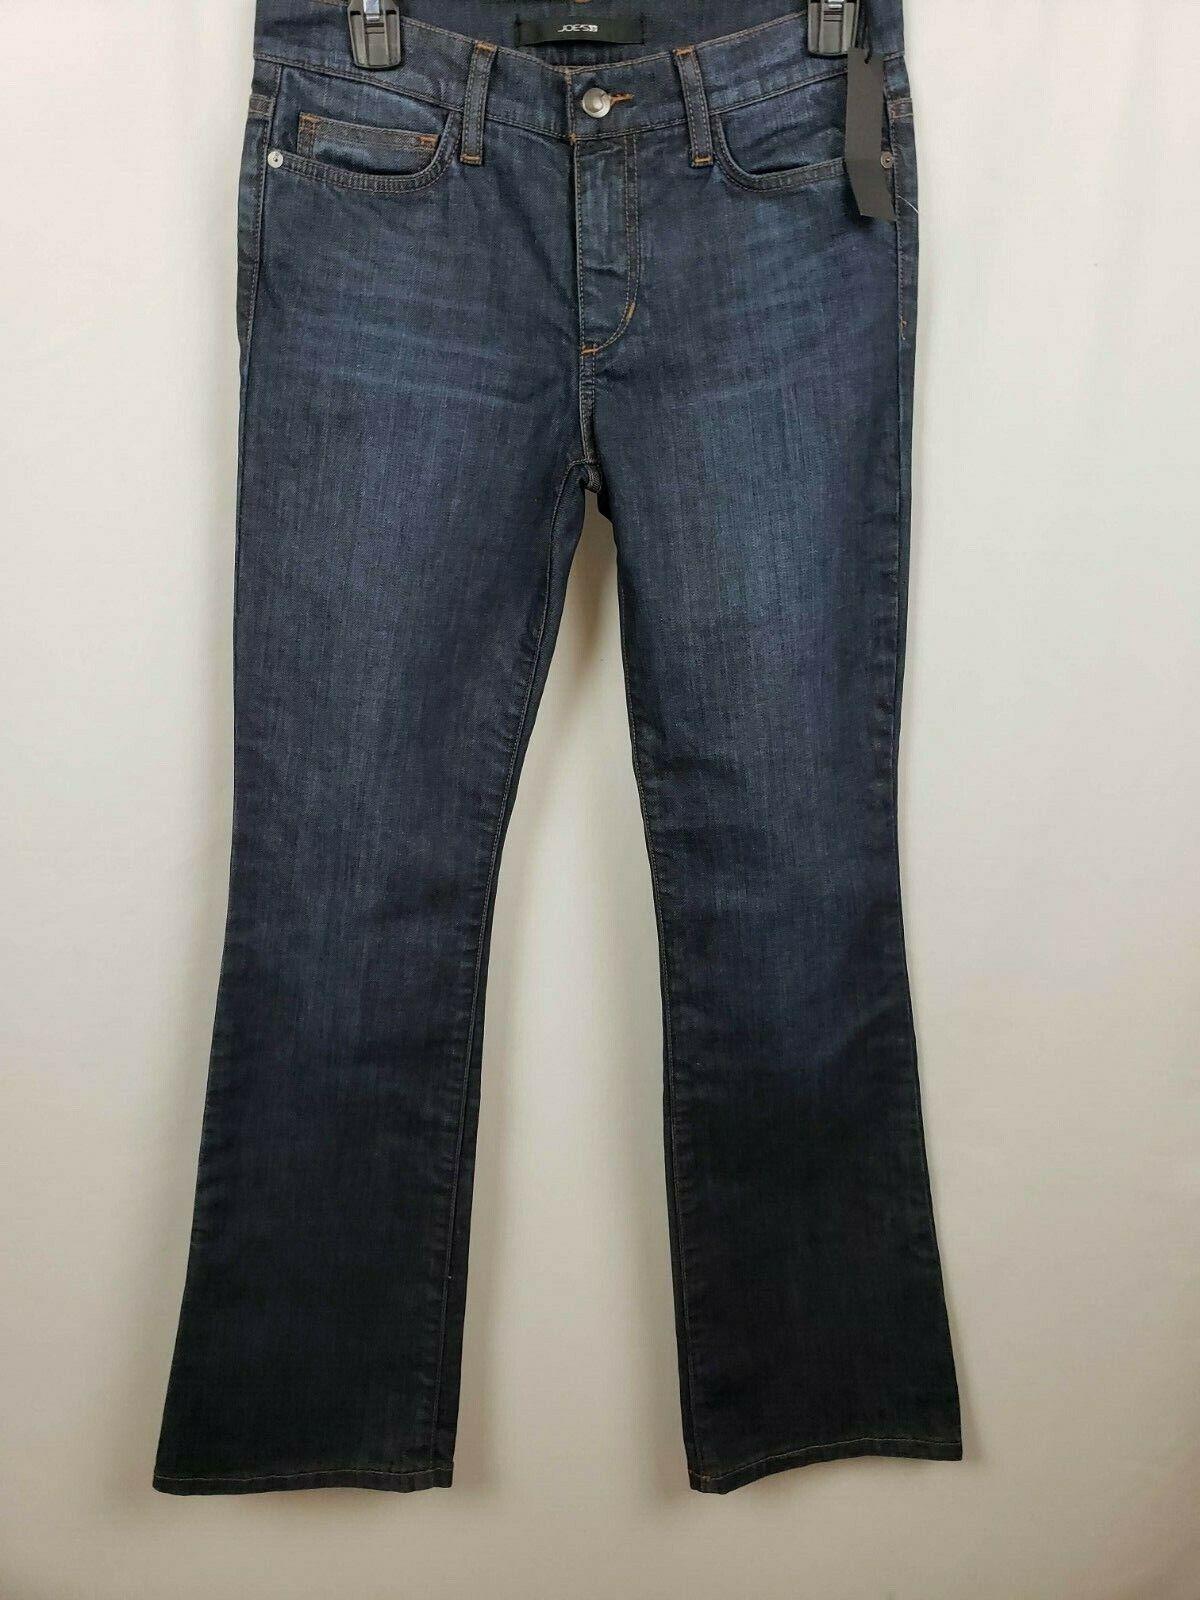 Joe's Veronica Women's Provocateur Petite Fit Dark Denim bluee Jeans Size 26 New